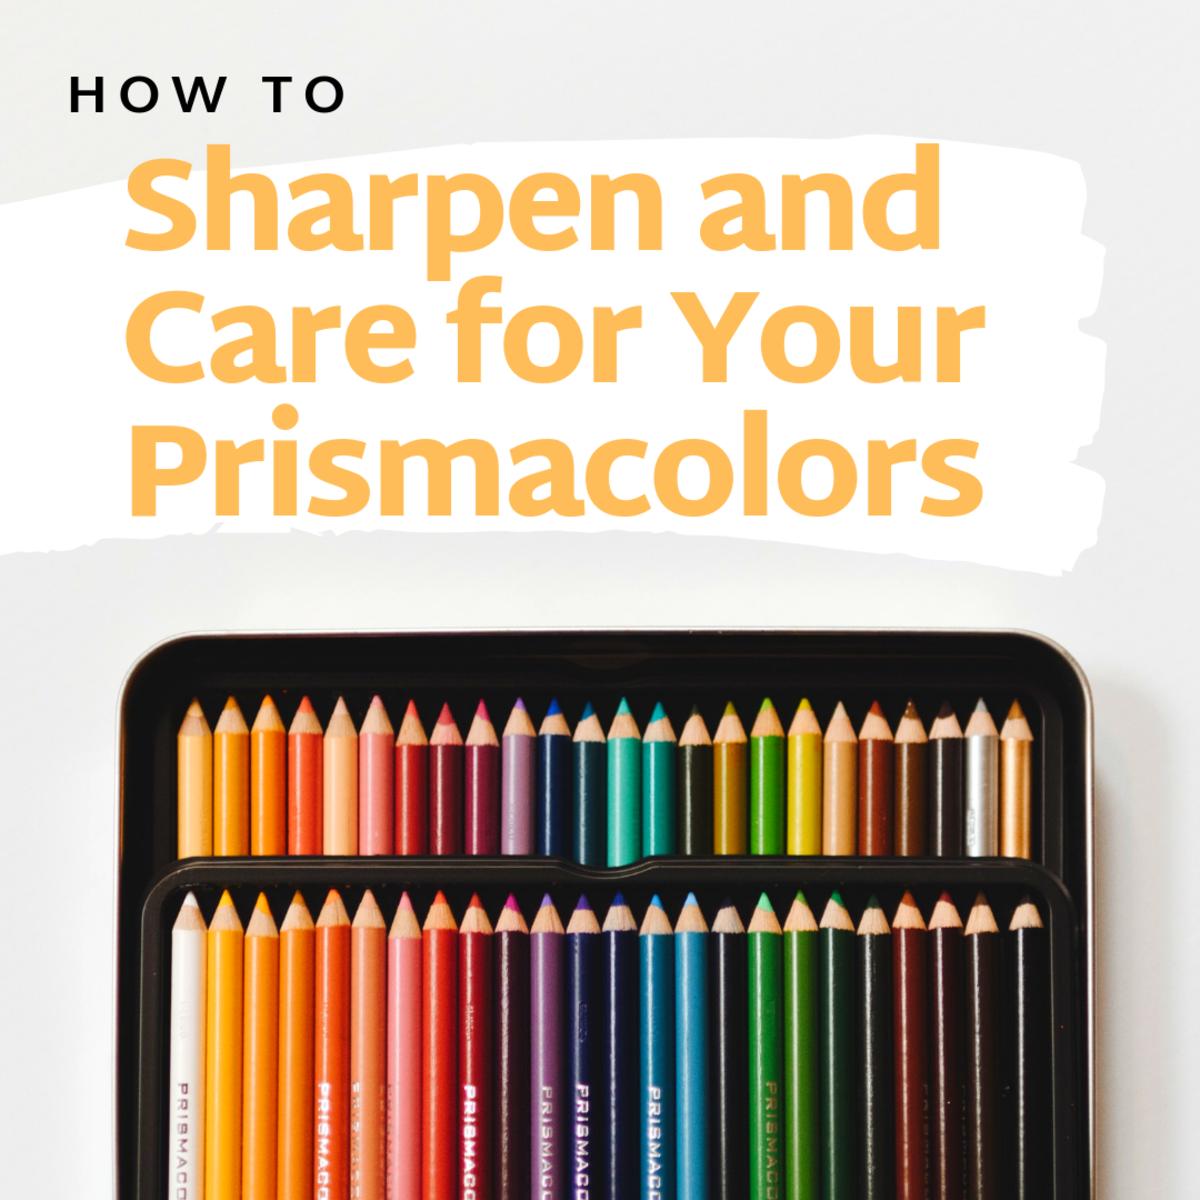 How to Sharpen Prismacolor Pencils